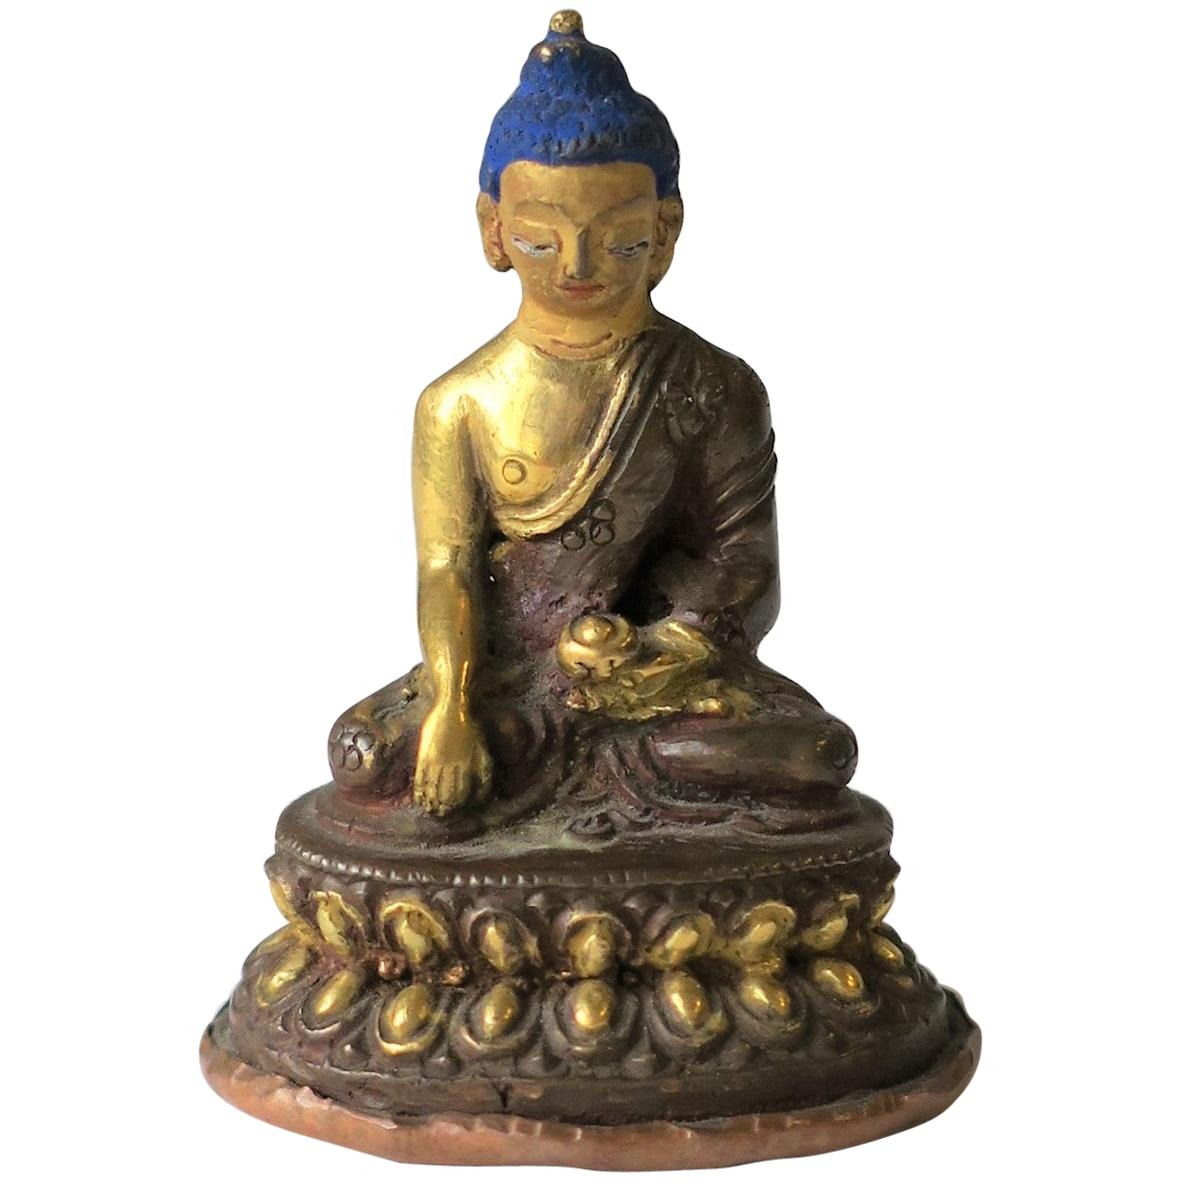 Asian Thai Gold Gilt Bronze Buddha Sculpture, circa 19th Century